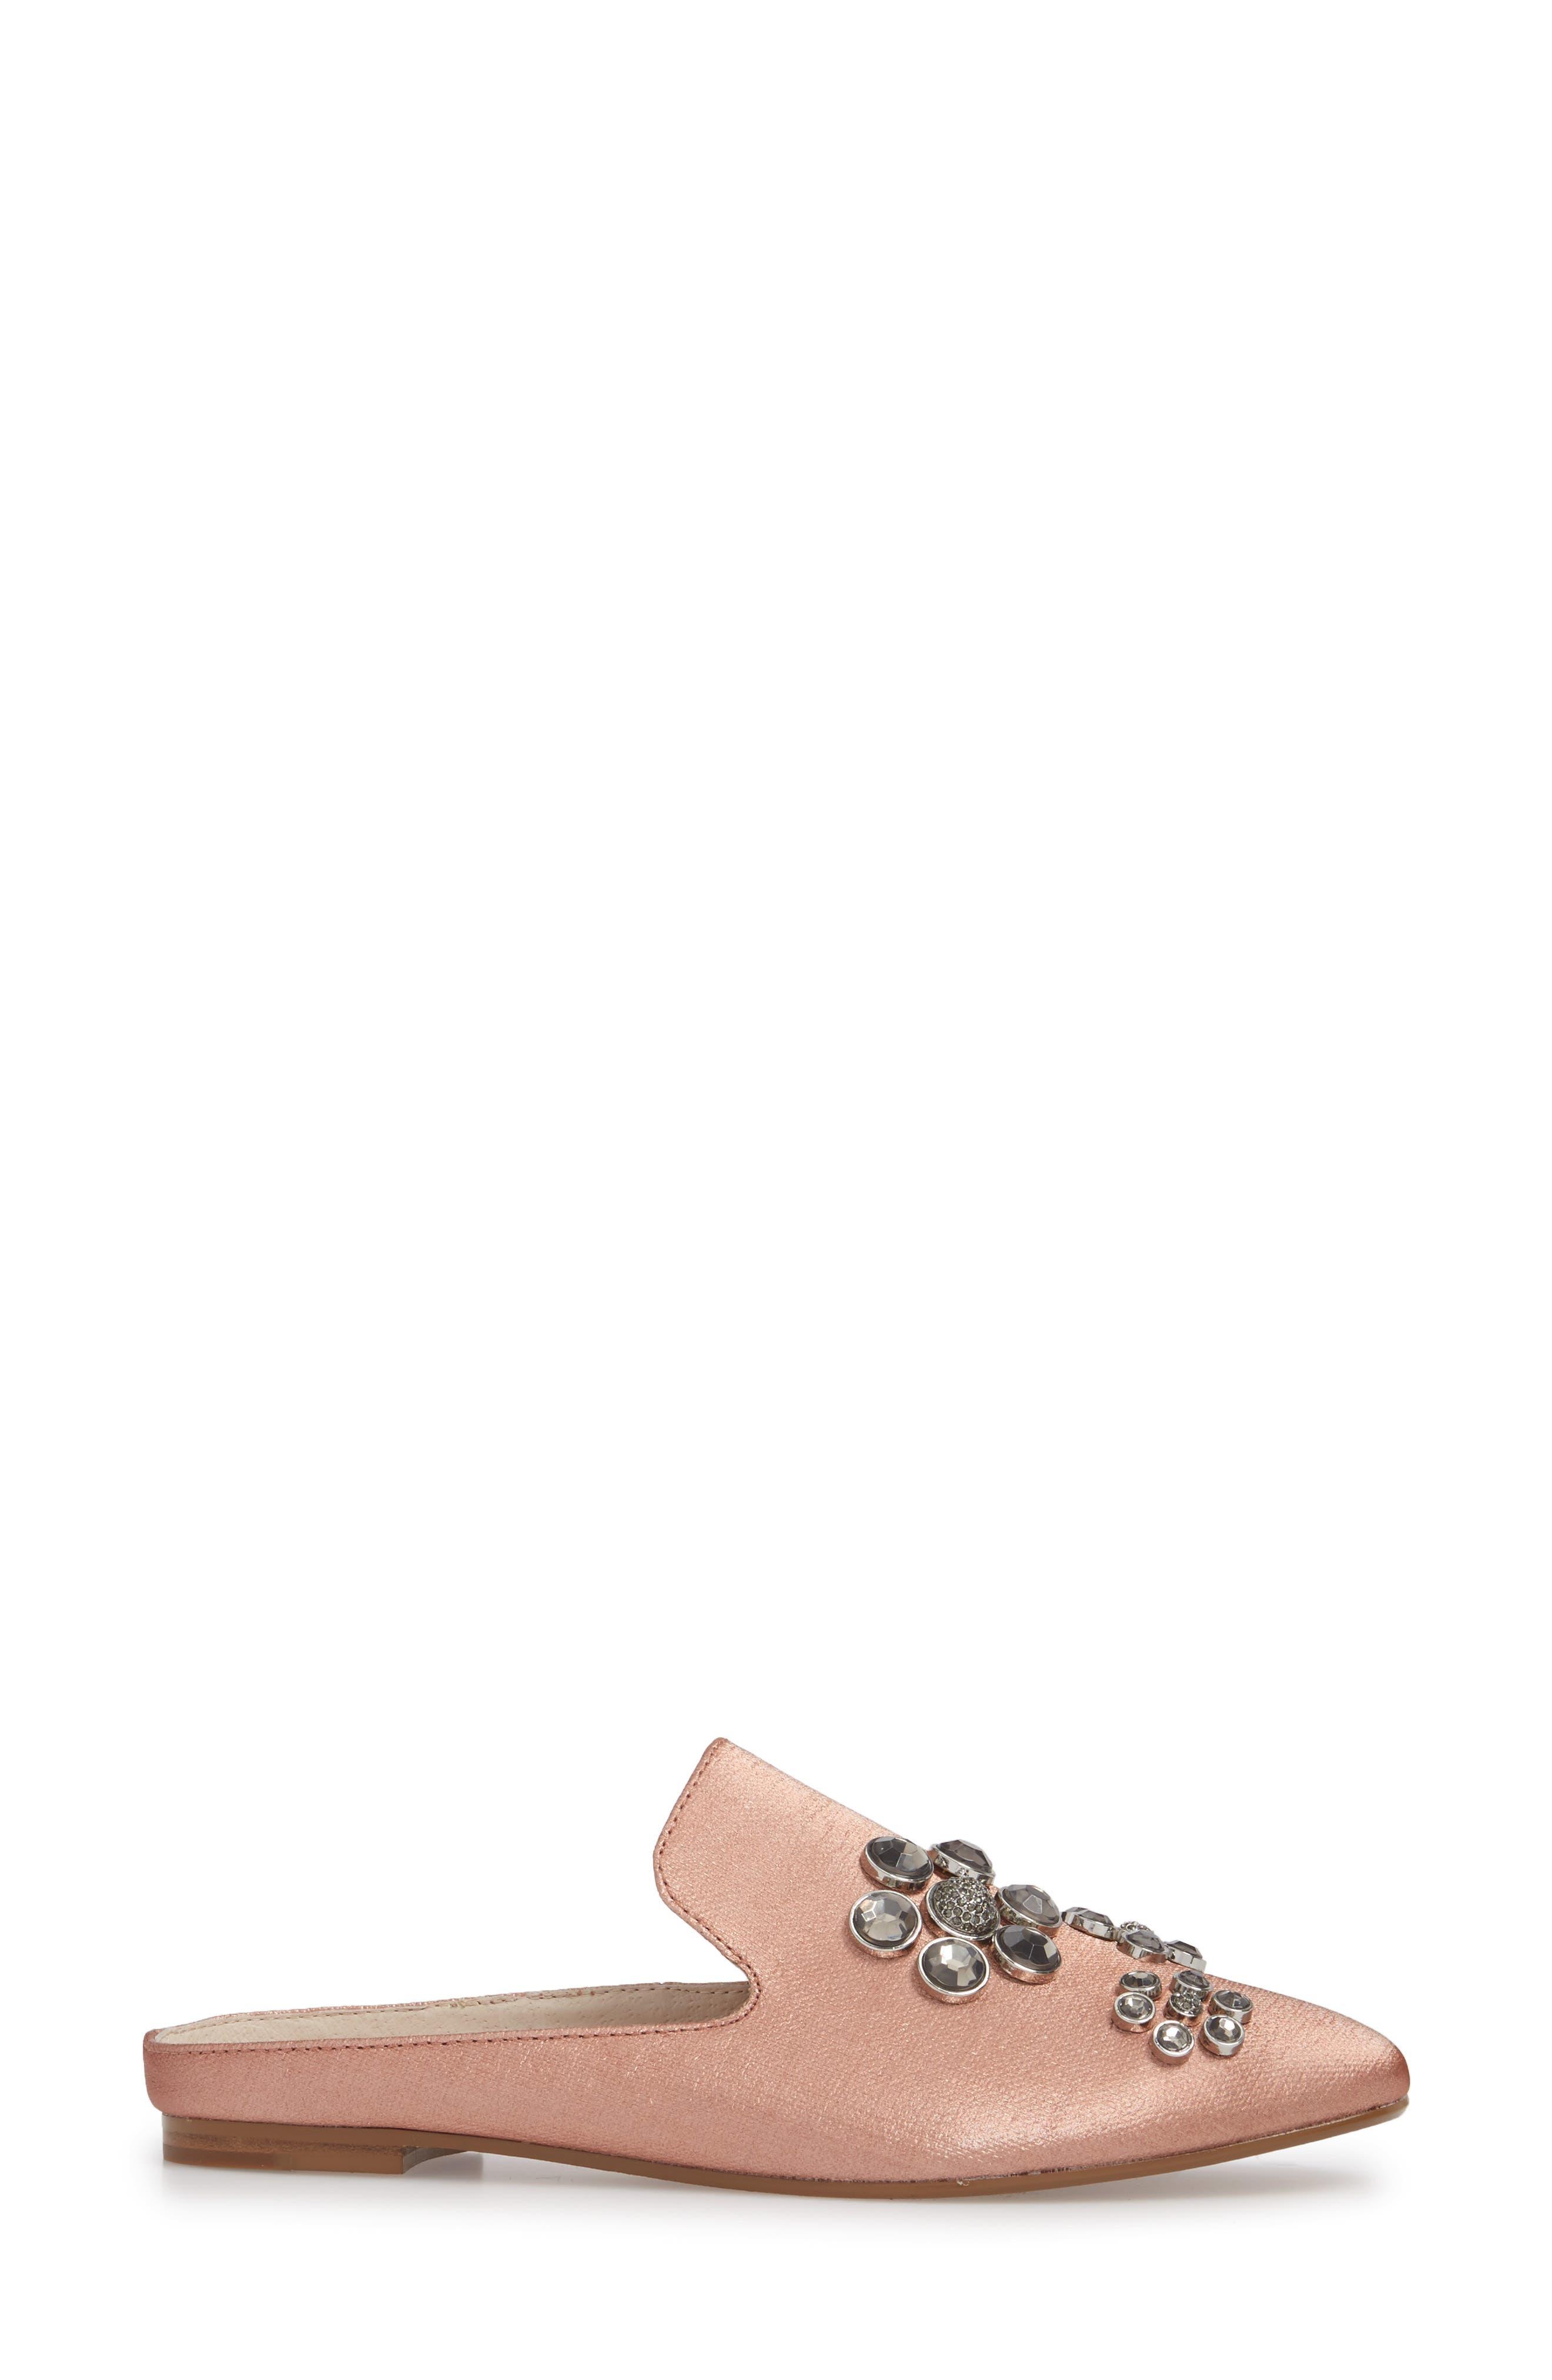 Felix II Crystal Flower Loafer Mule,                             Alternate thumbnail 3, color,                             Antique Rosetta Linen Fabric